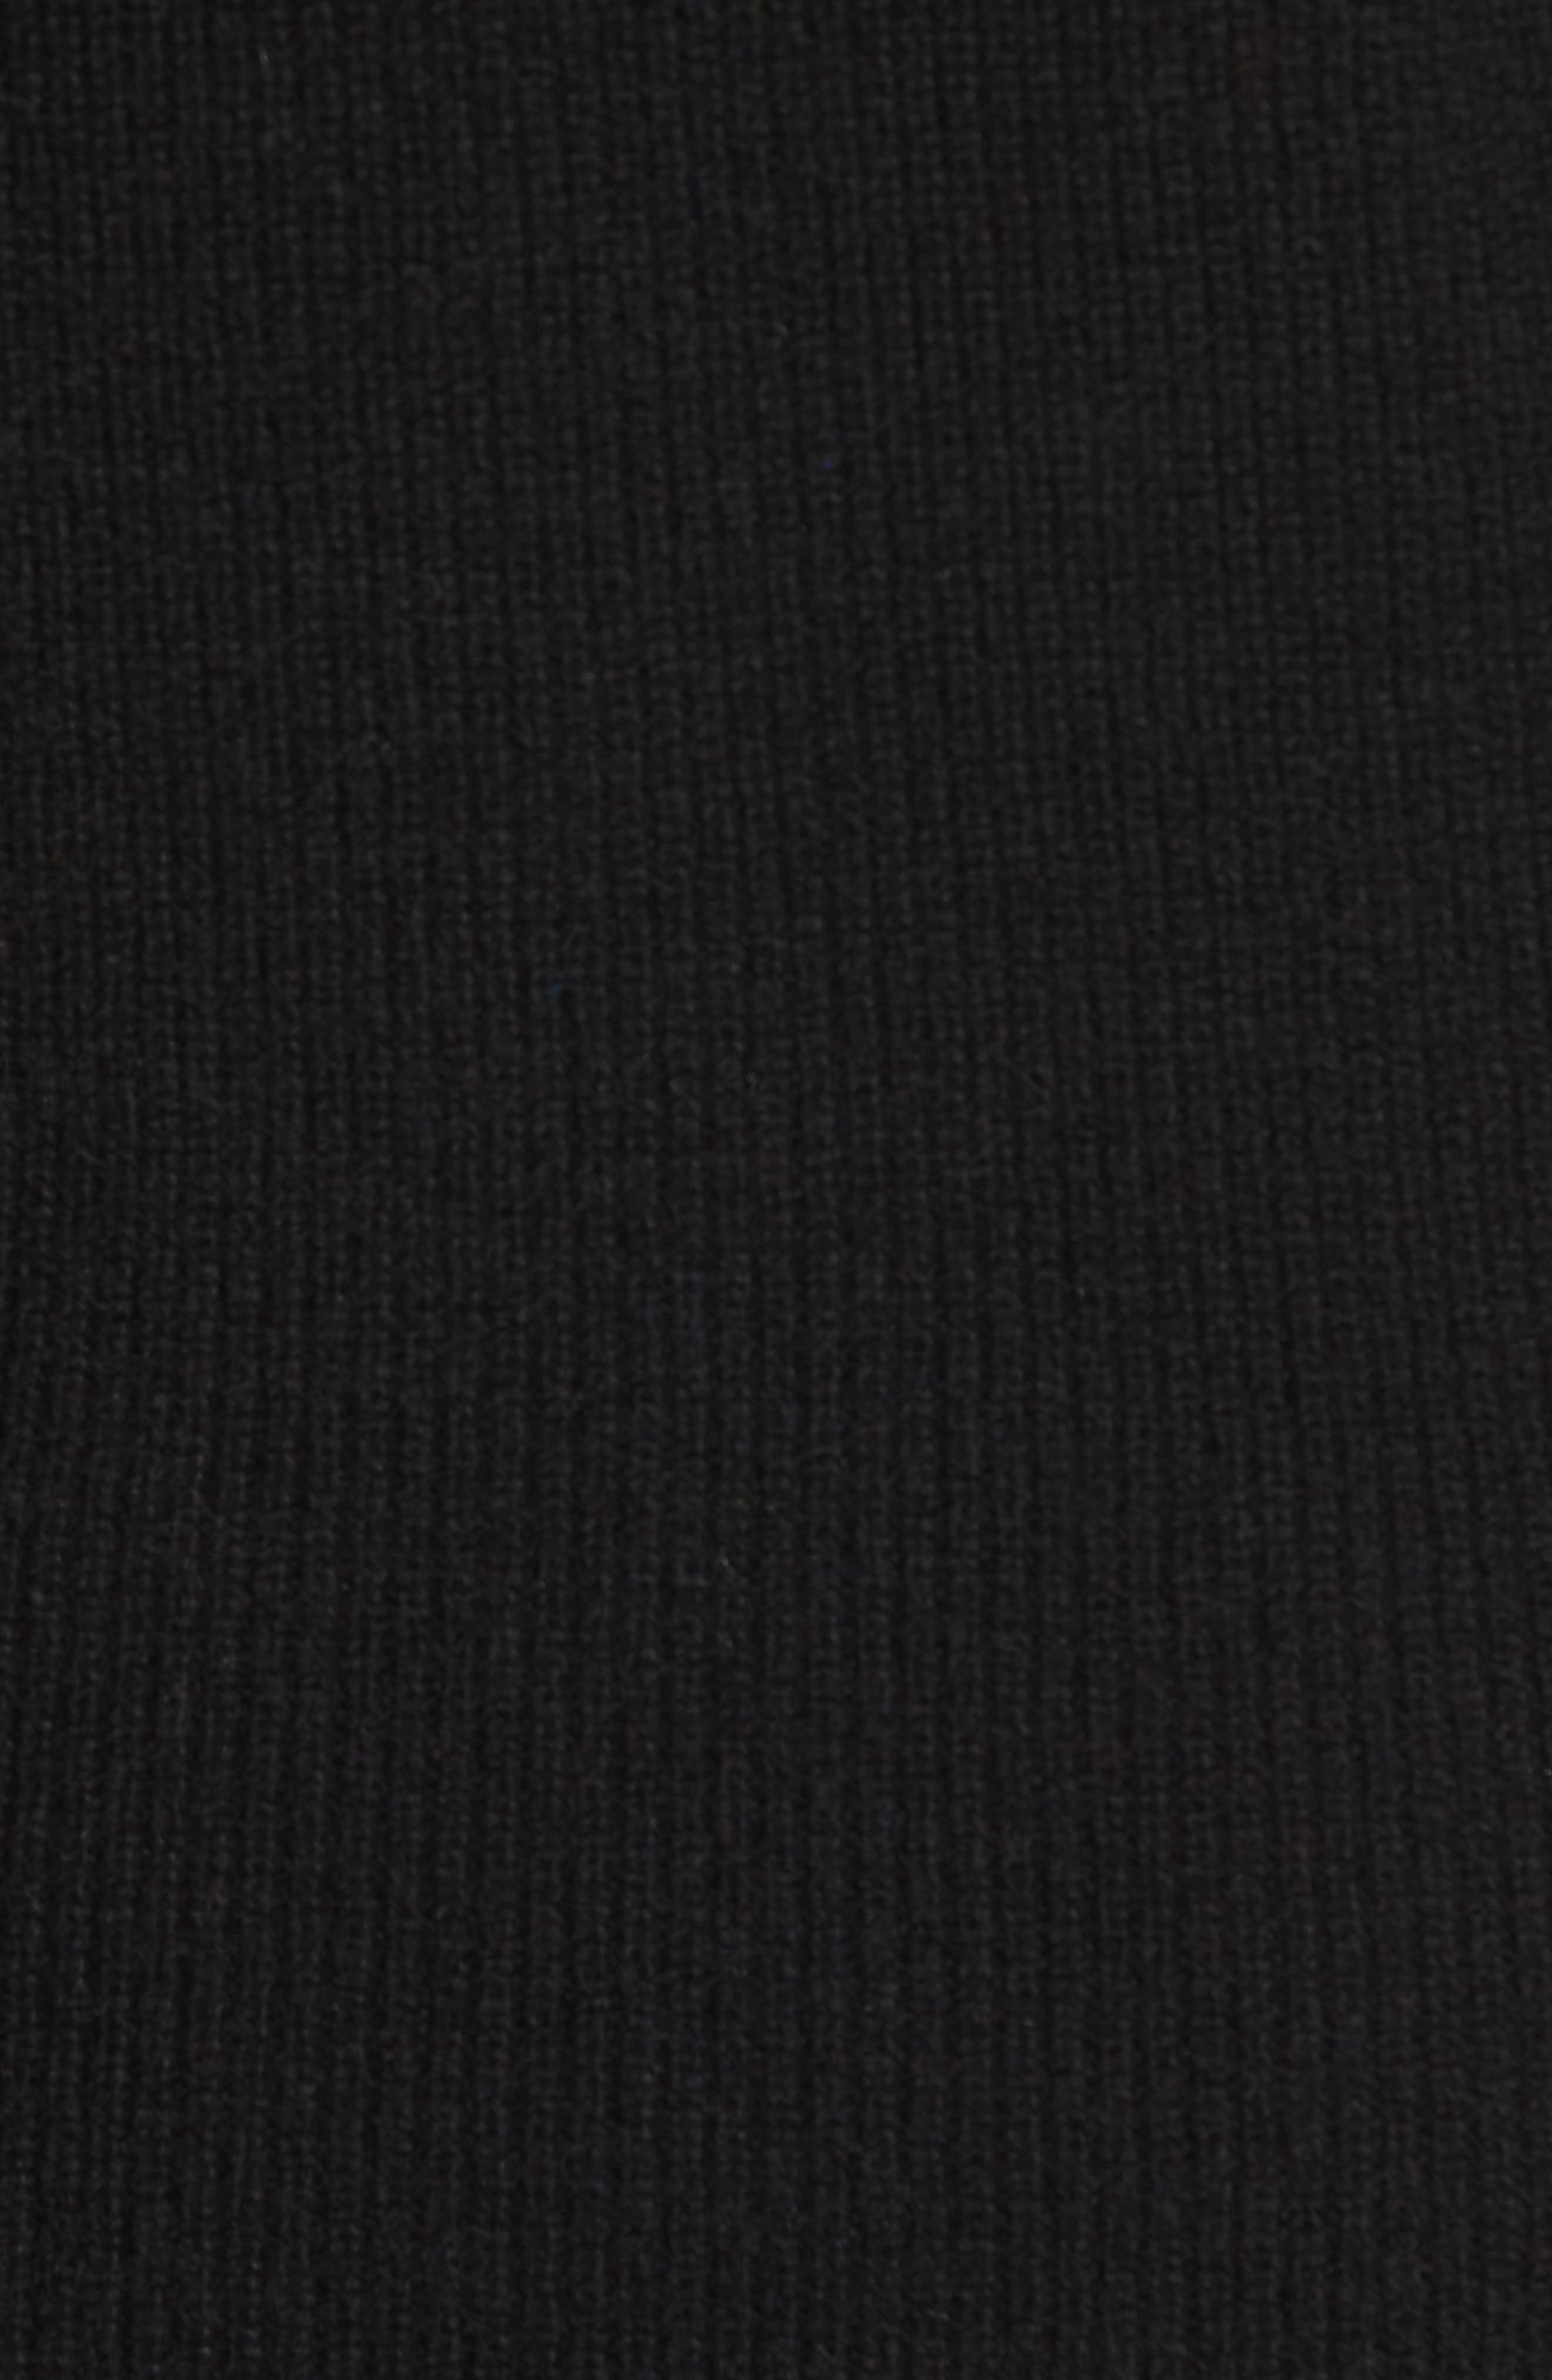 Cashmere Puff Sleeve Turtleneck,                             Alternate thumbnail 5, color,                             BLACK